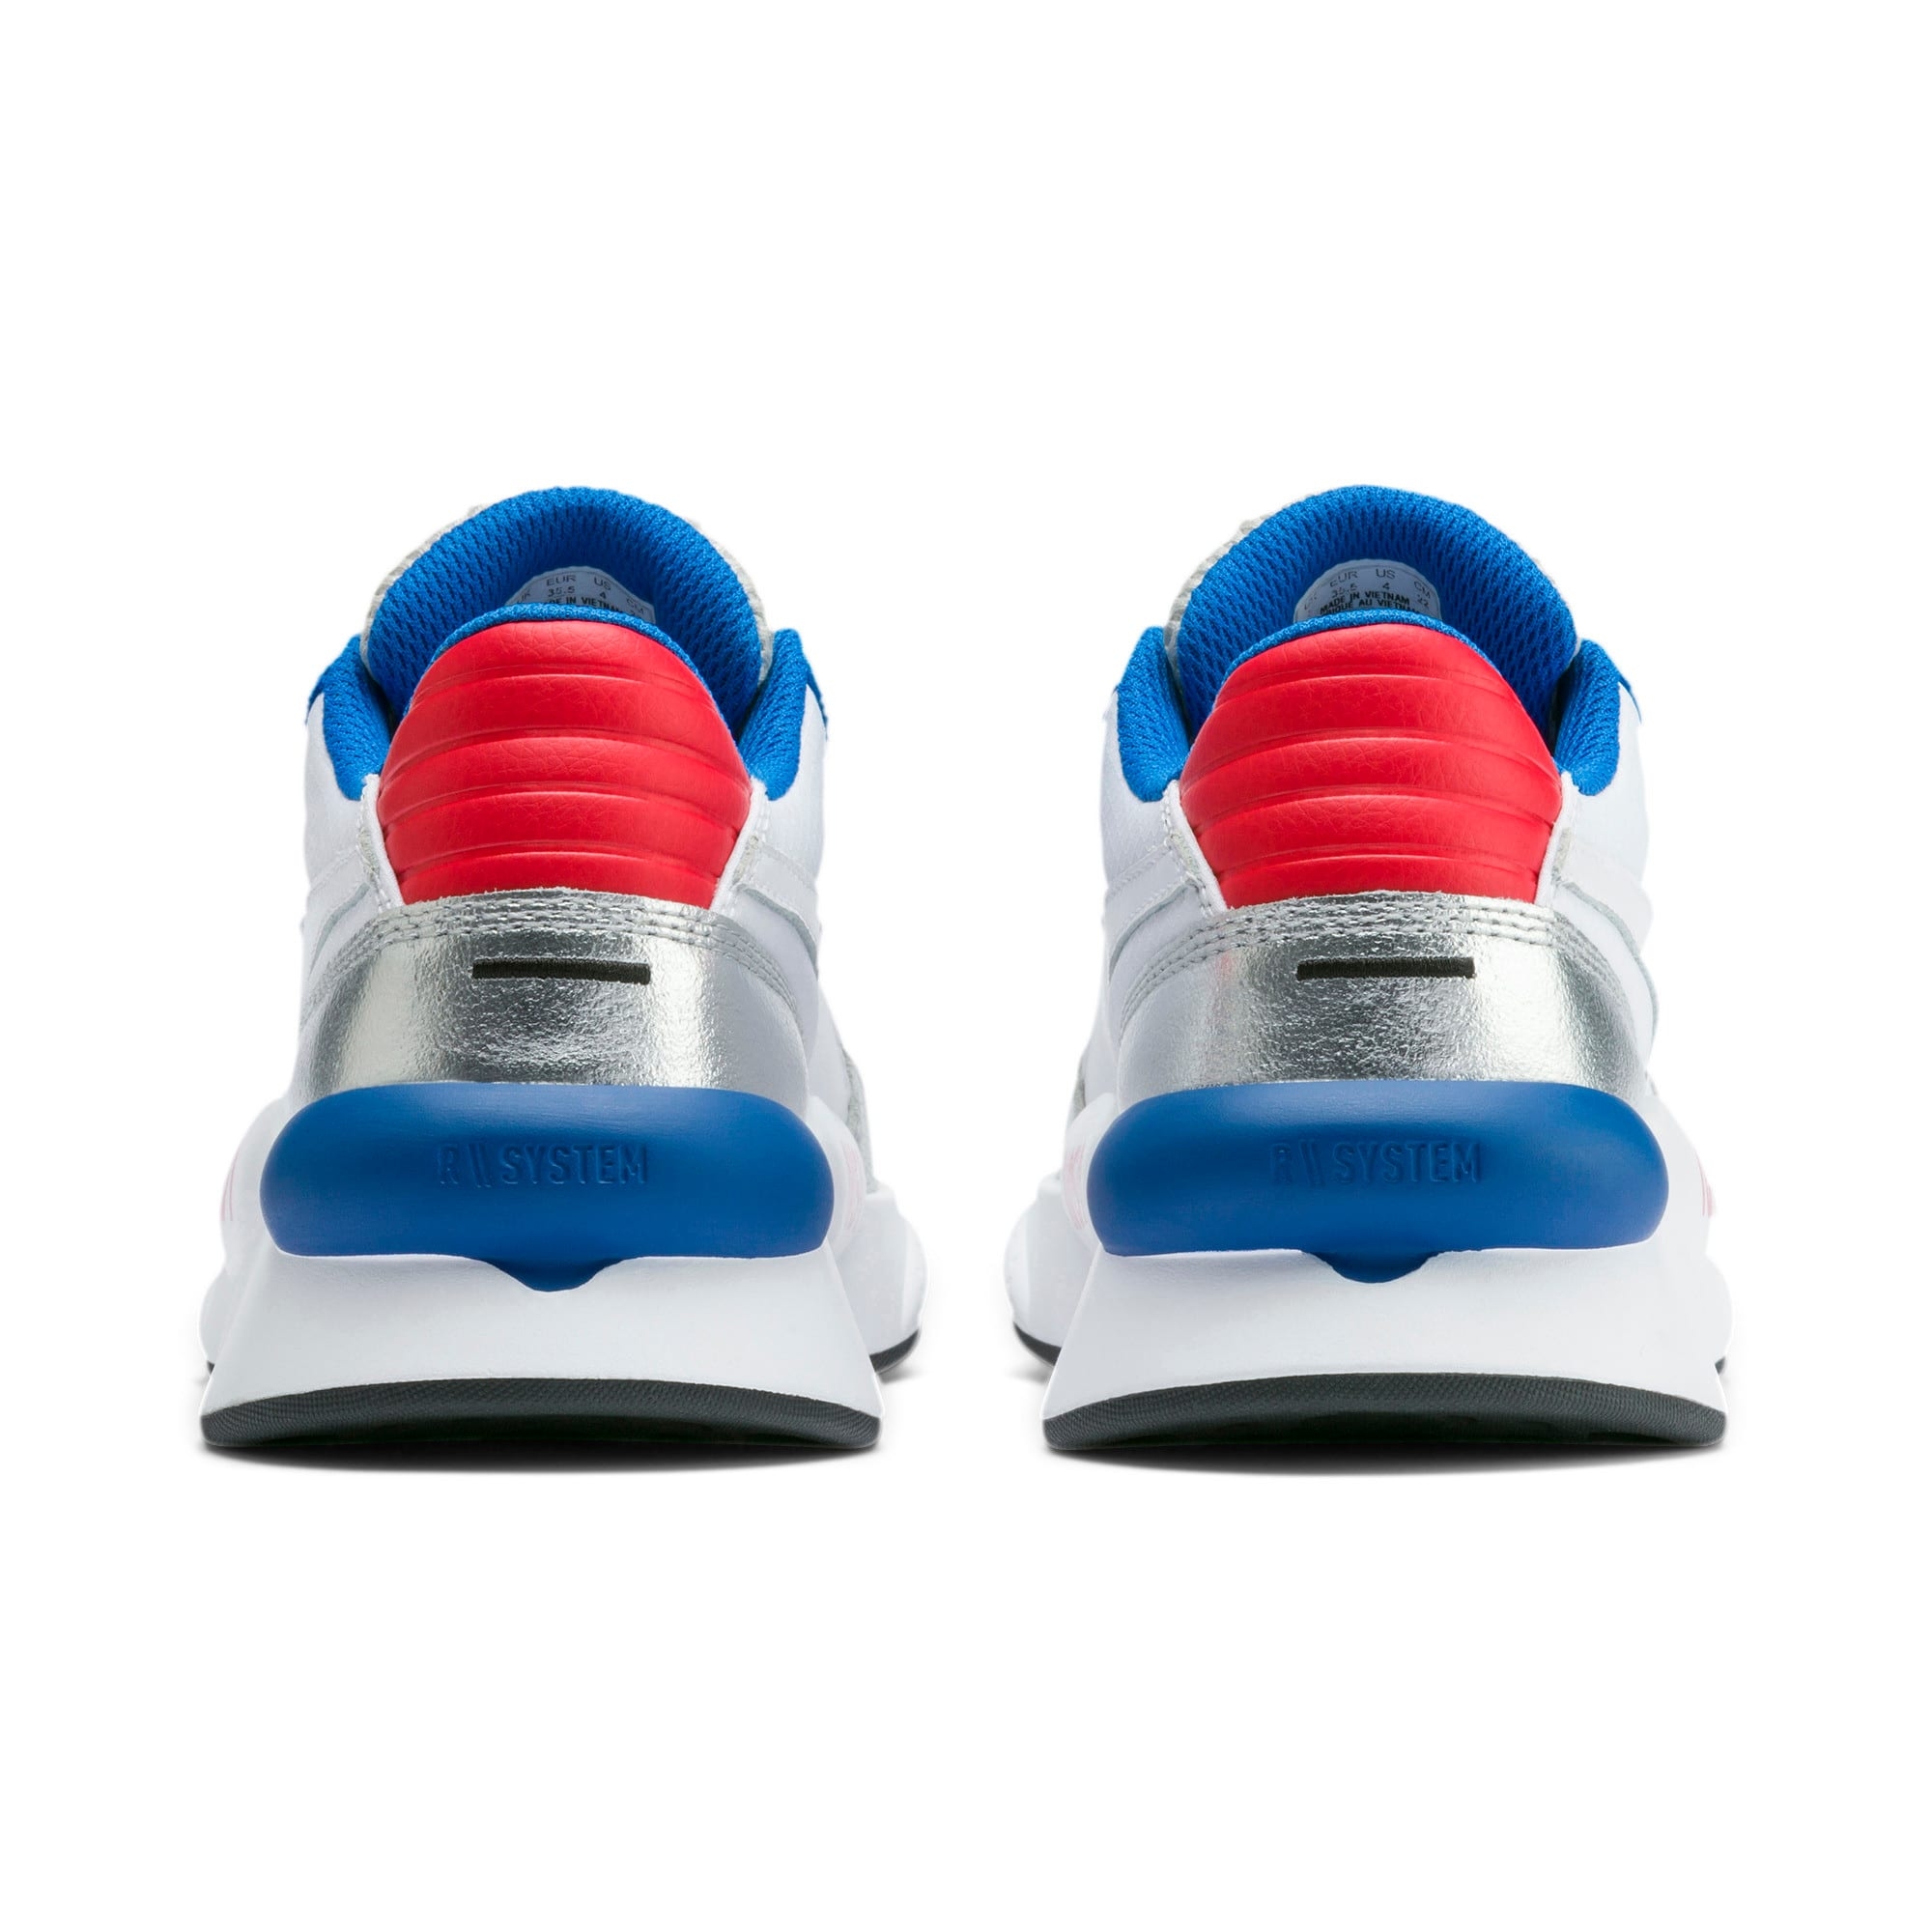 Thumbnail 3 of RS 9.8 Space Agency Sneakers JR, Puma White-Puma Silver, medium